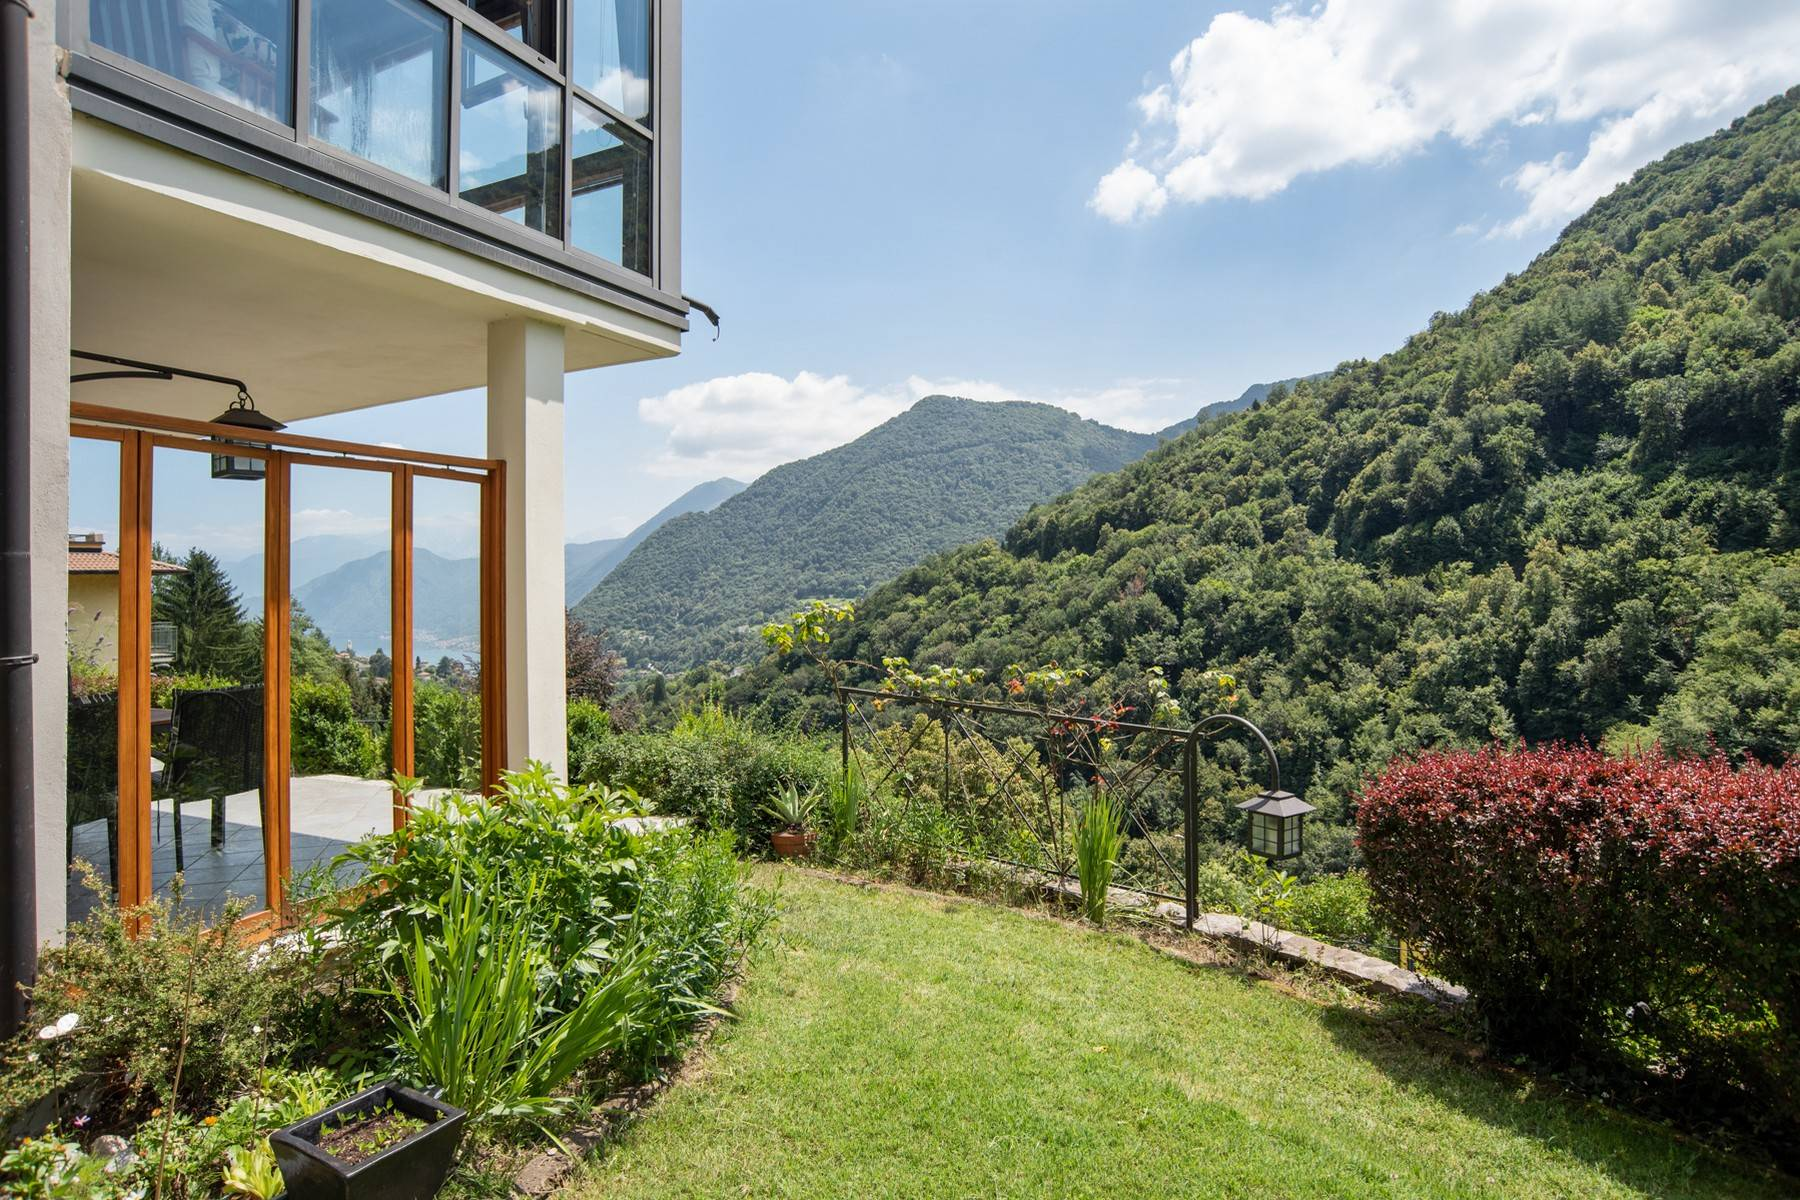 Splendida villa moderna sulla collina soleggiata sopra Argegno - 8